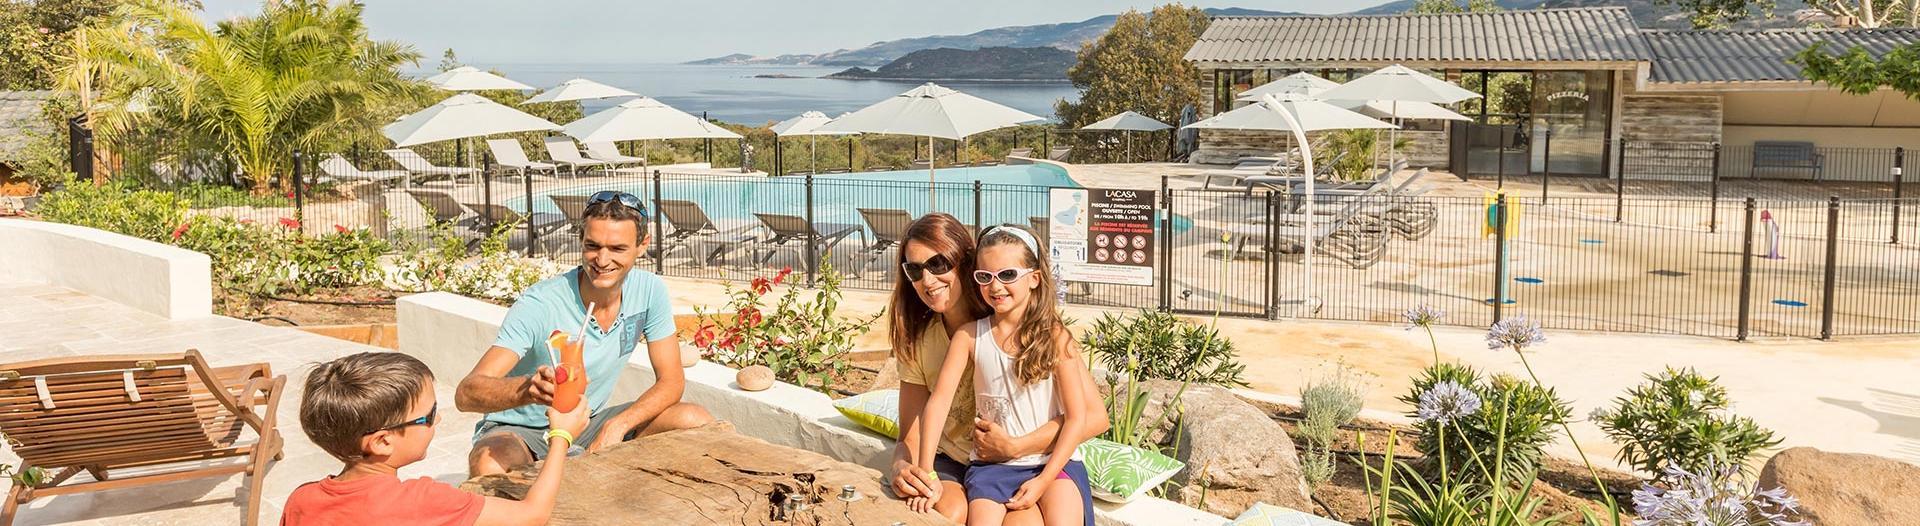 slider-camping-la-casa-piscine-vue-sur-mer